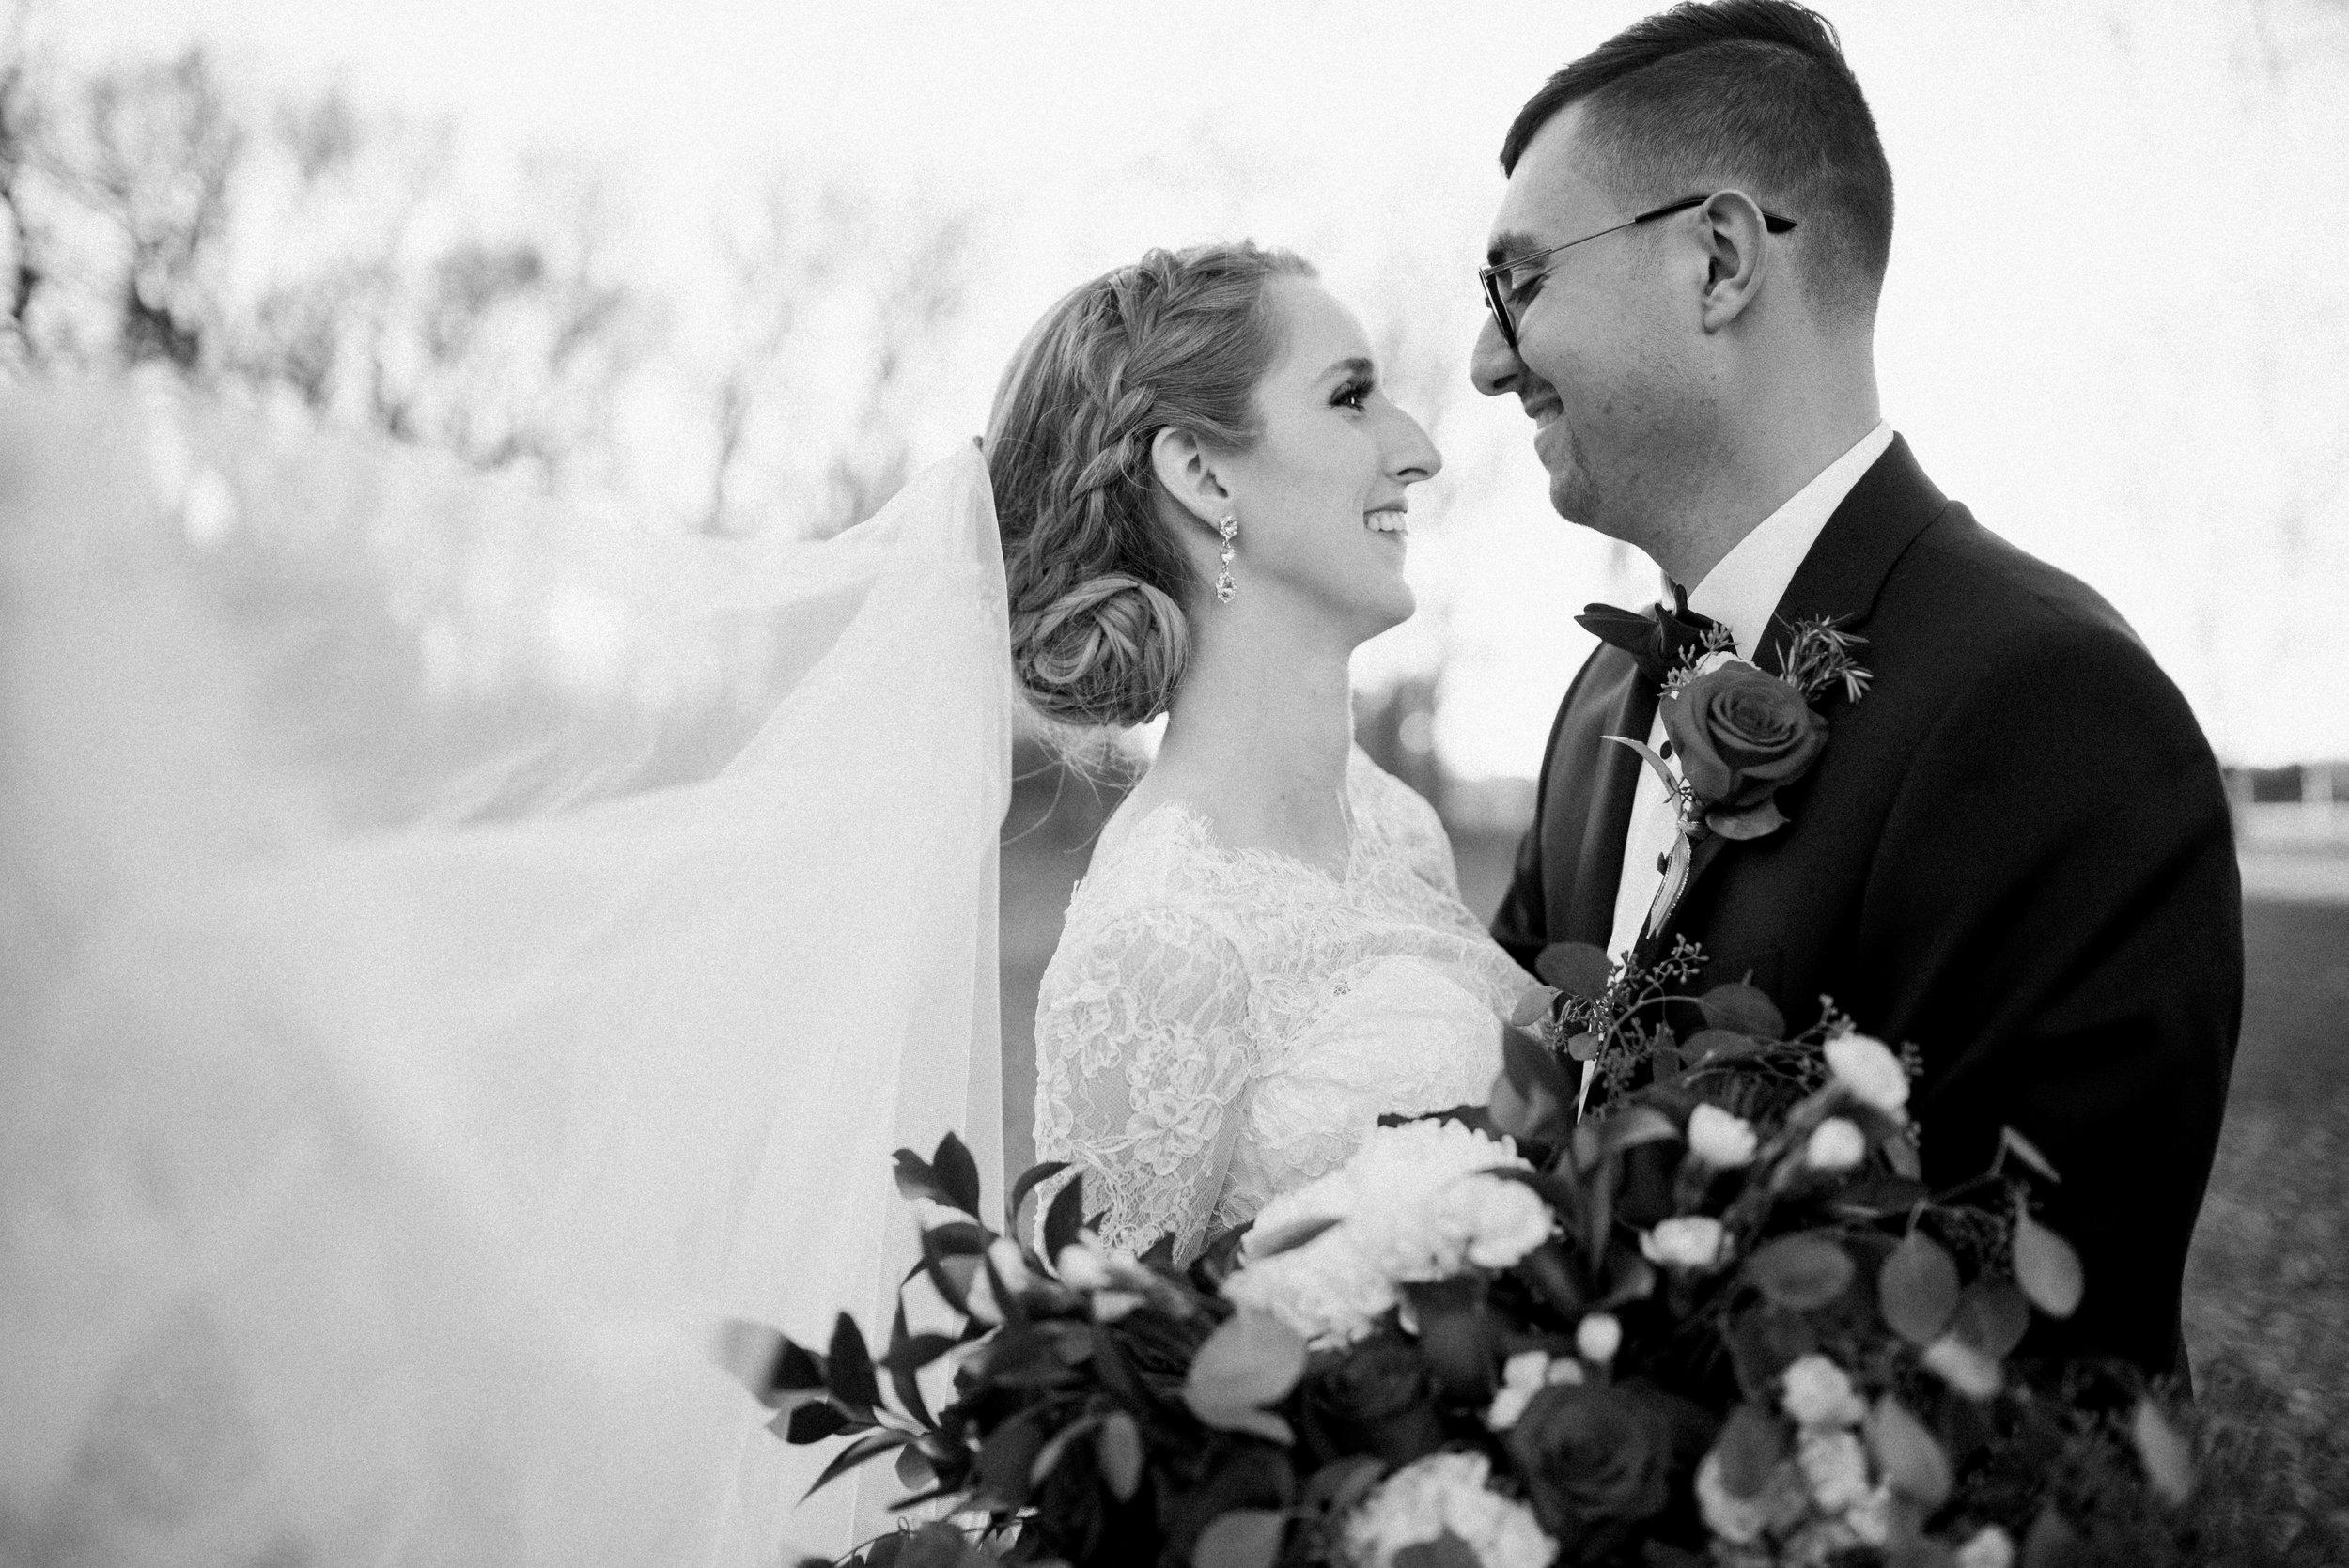 Multicultural Windamere Wedding | Dayton Wedding Photographer